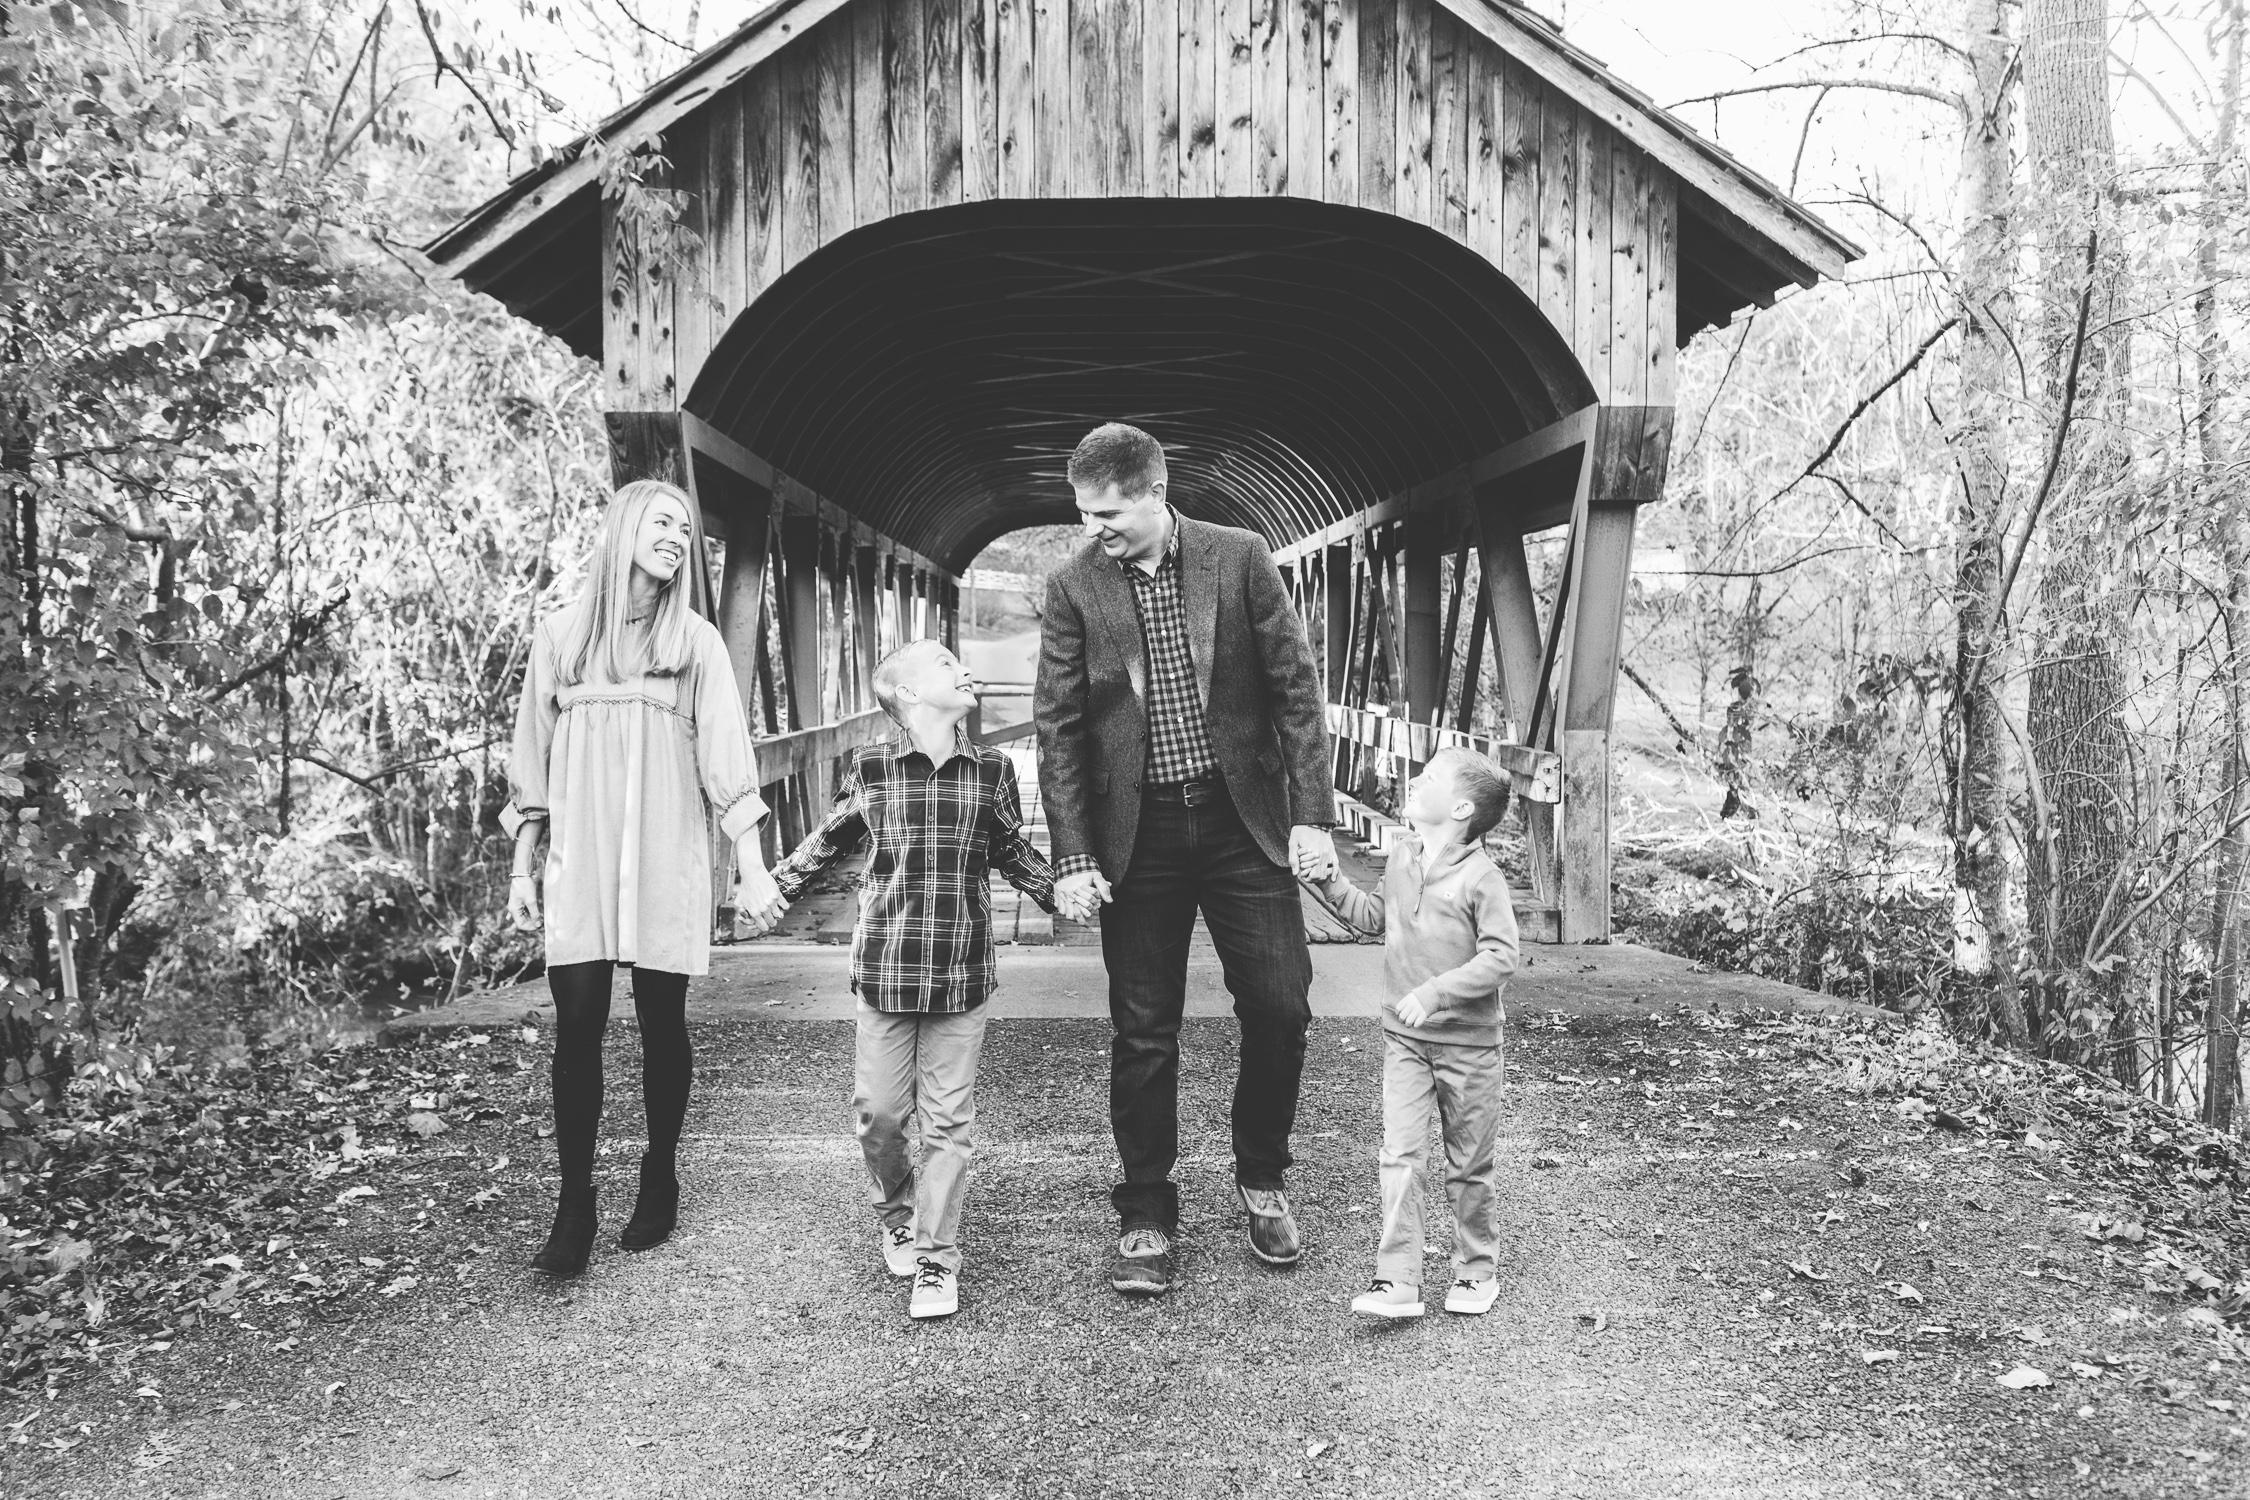 Blackberry Farms Family Photographer // Family Family Photos at Blackberry Farm